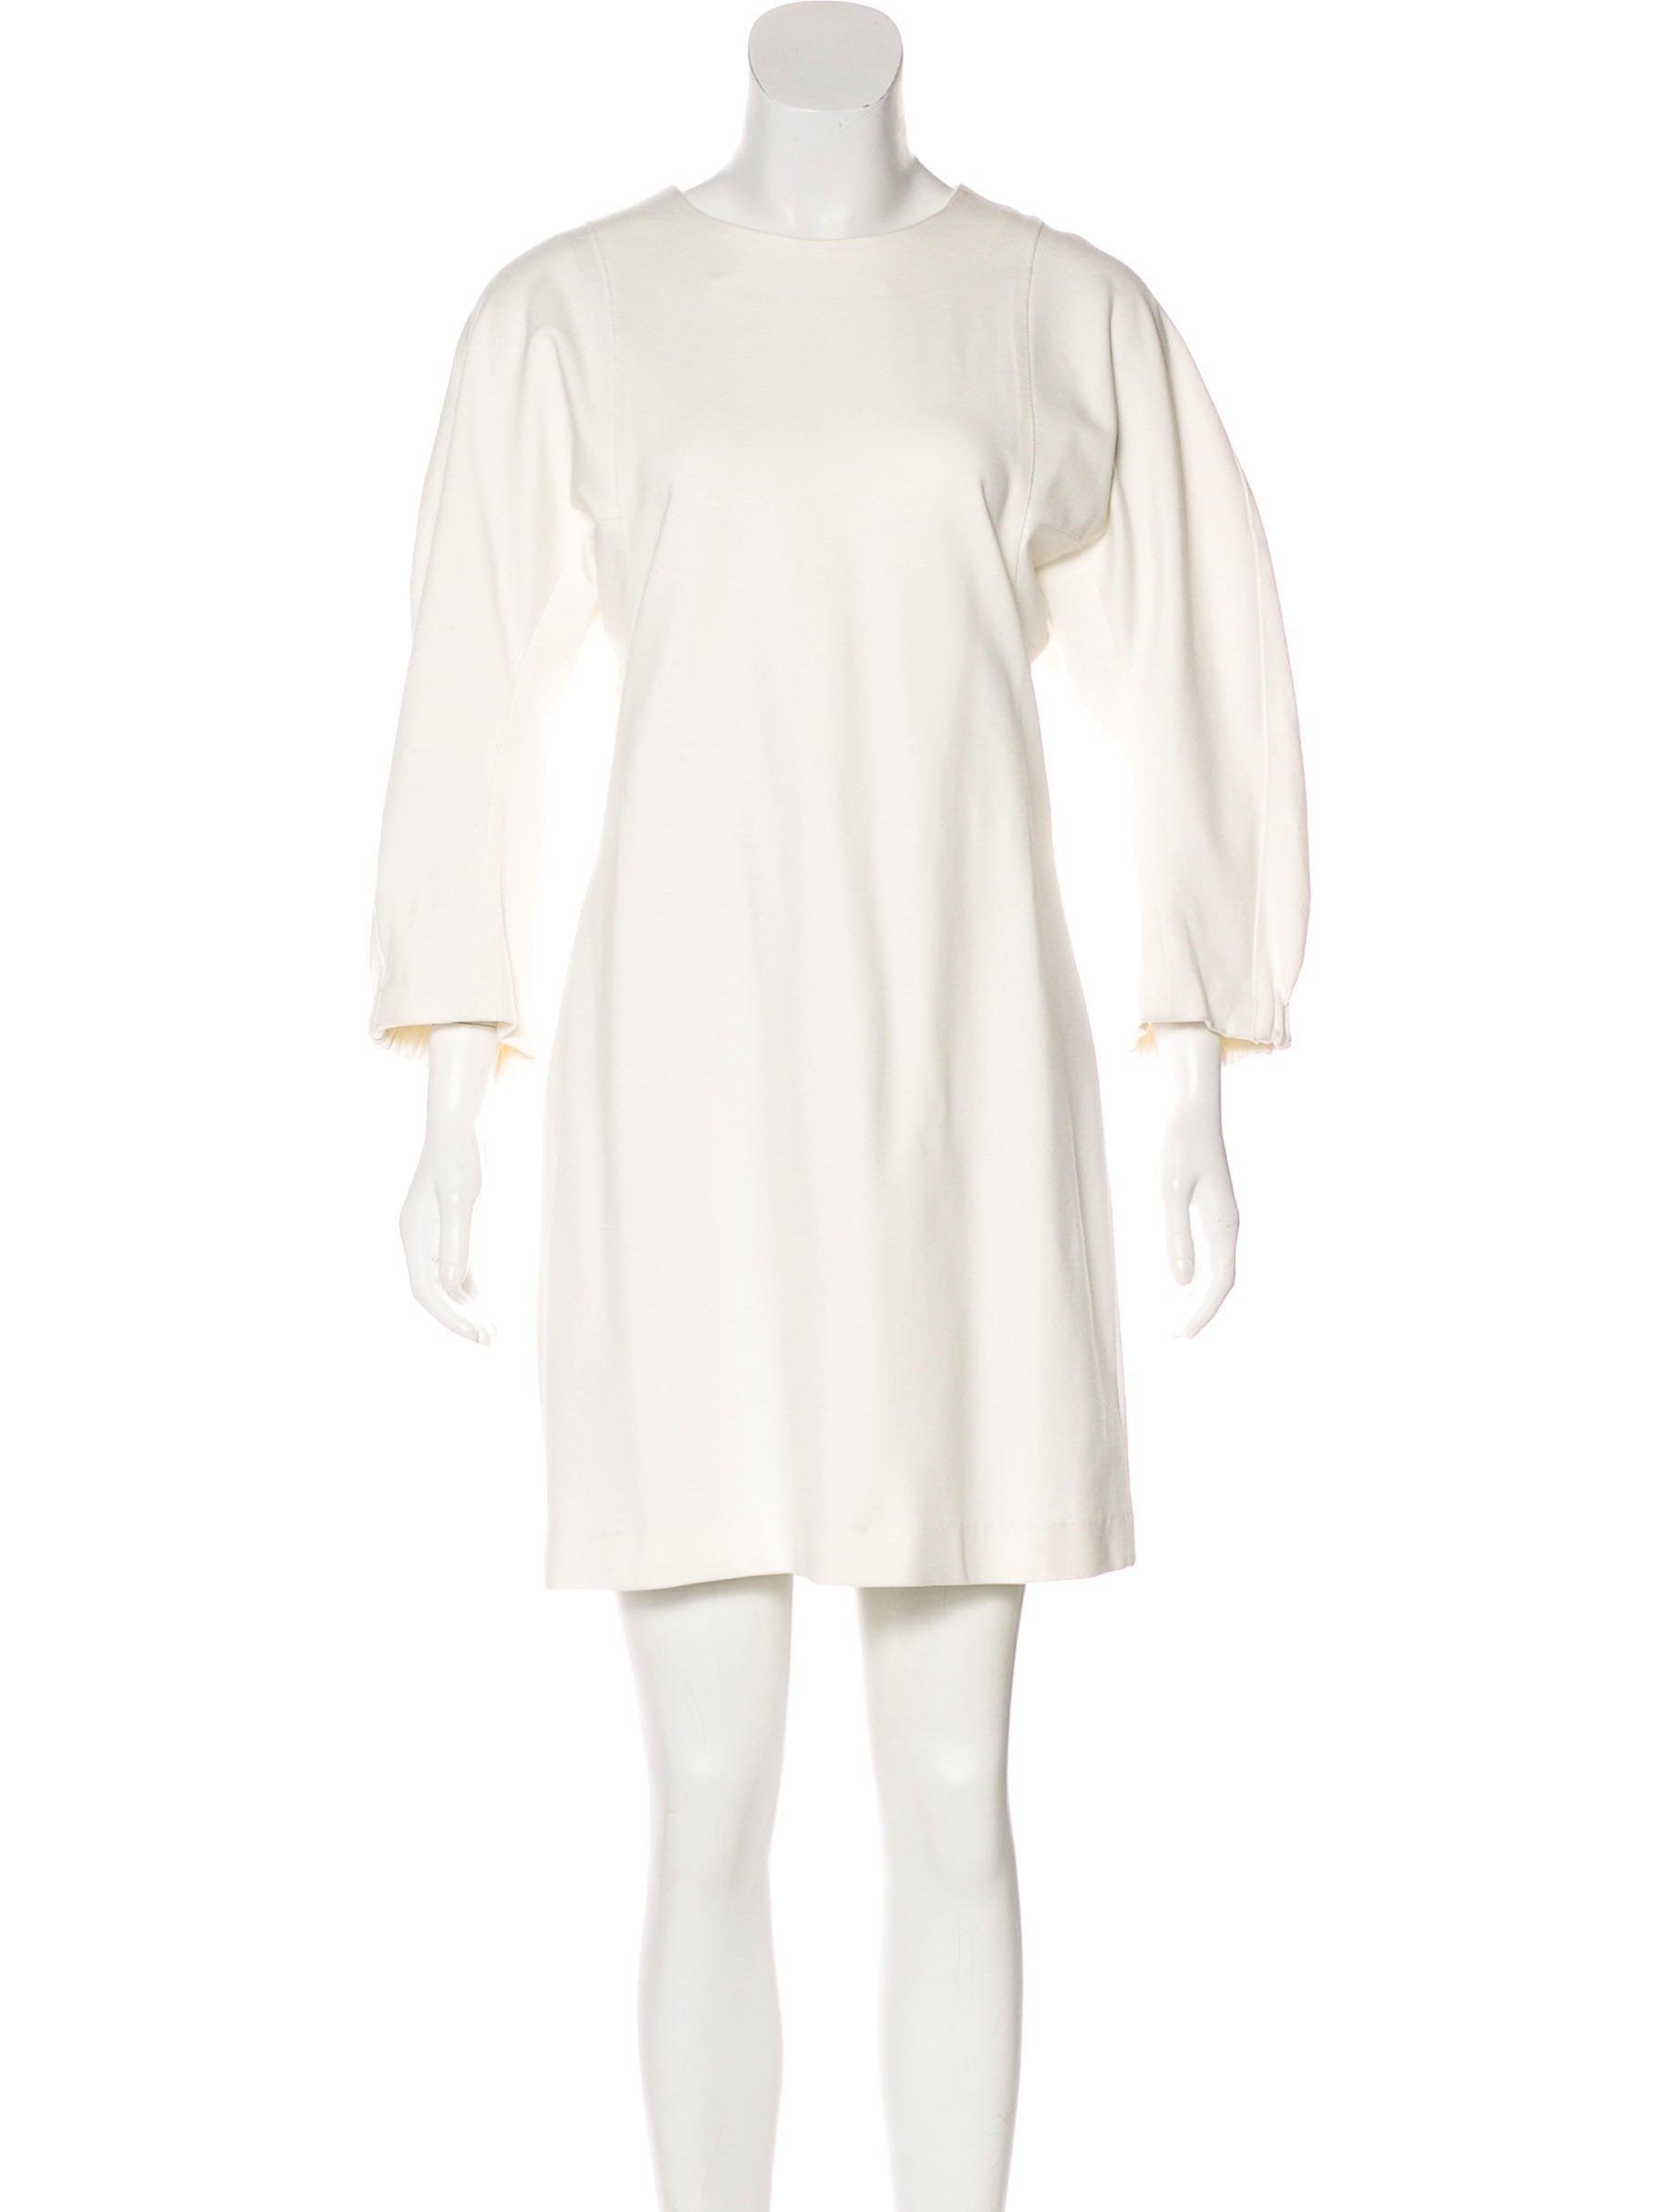 Tibi Long Sleeve Mini Dress - Clothing -           WTI55098 | The RealReal